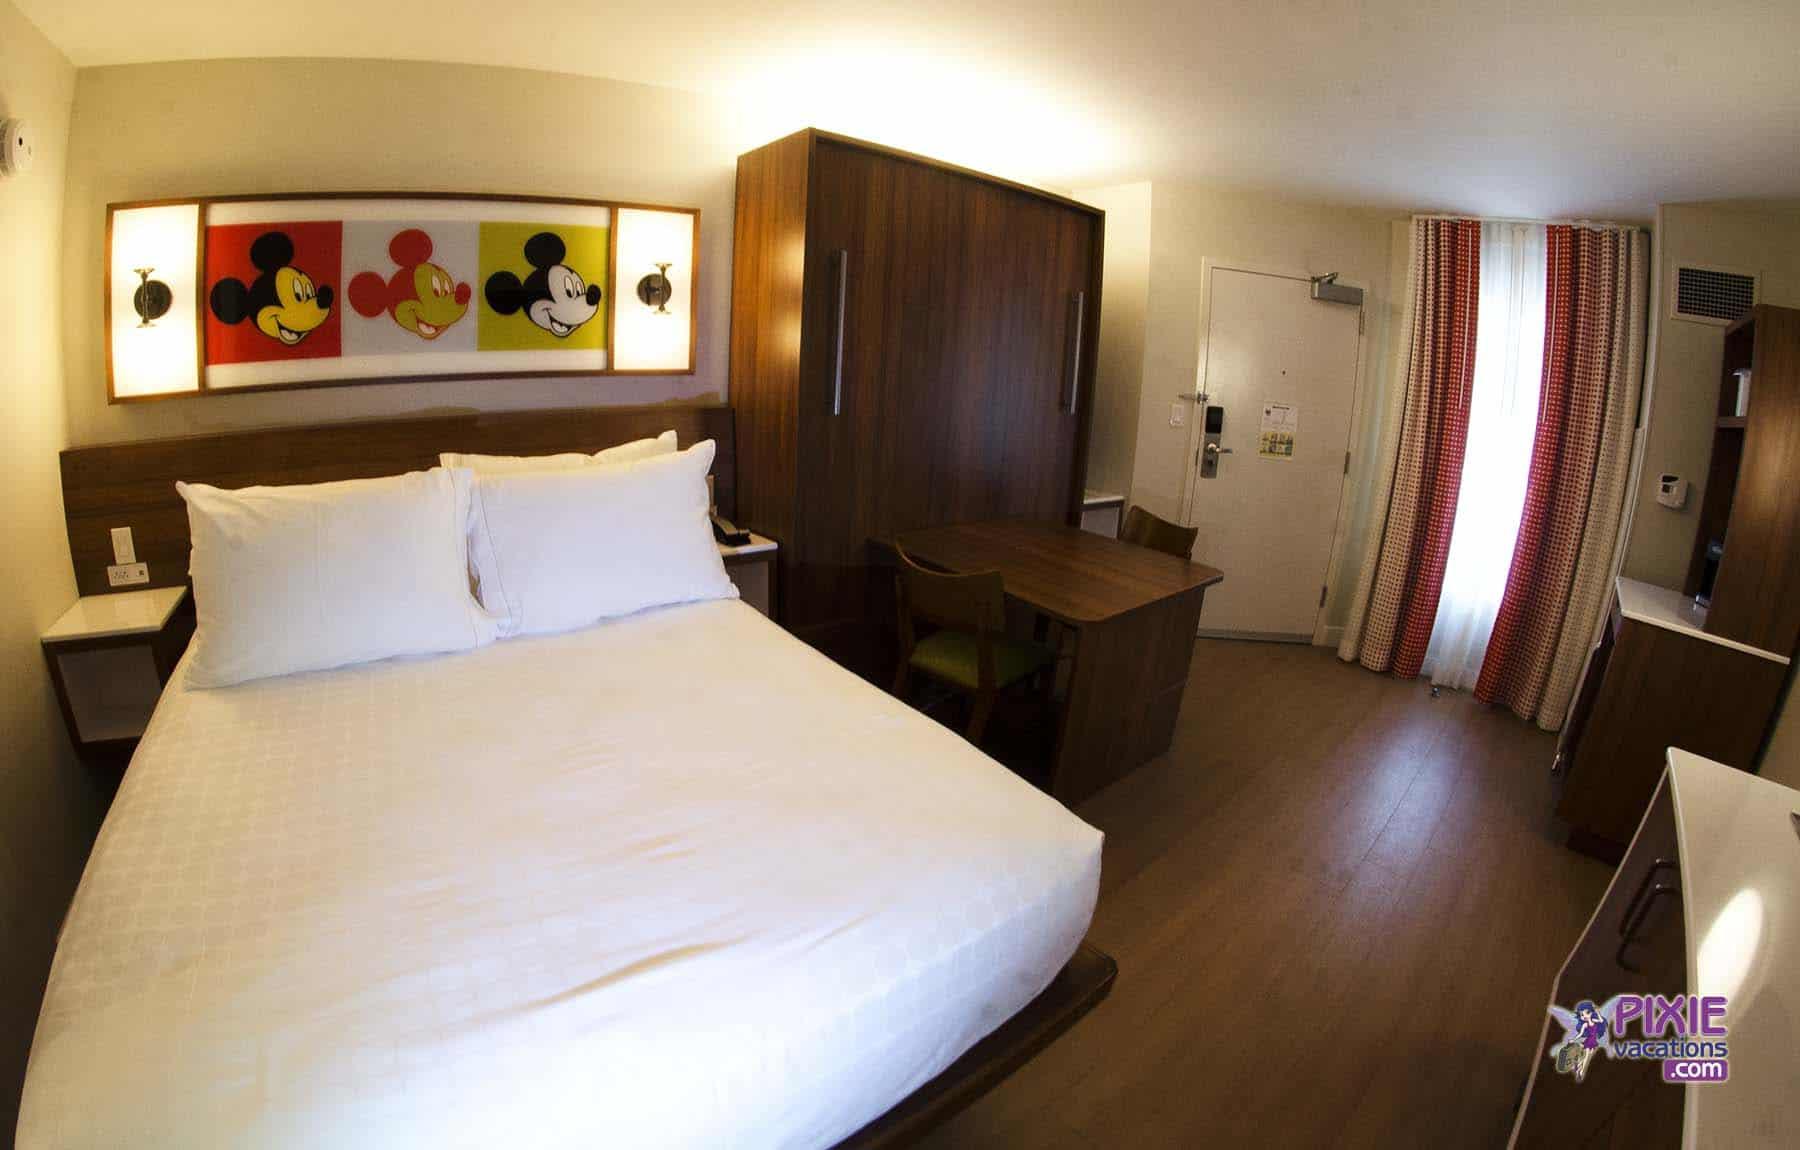 Walt Disney World Resort Tour  Best Rooms  MouseChatnet